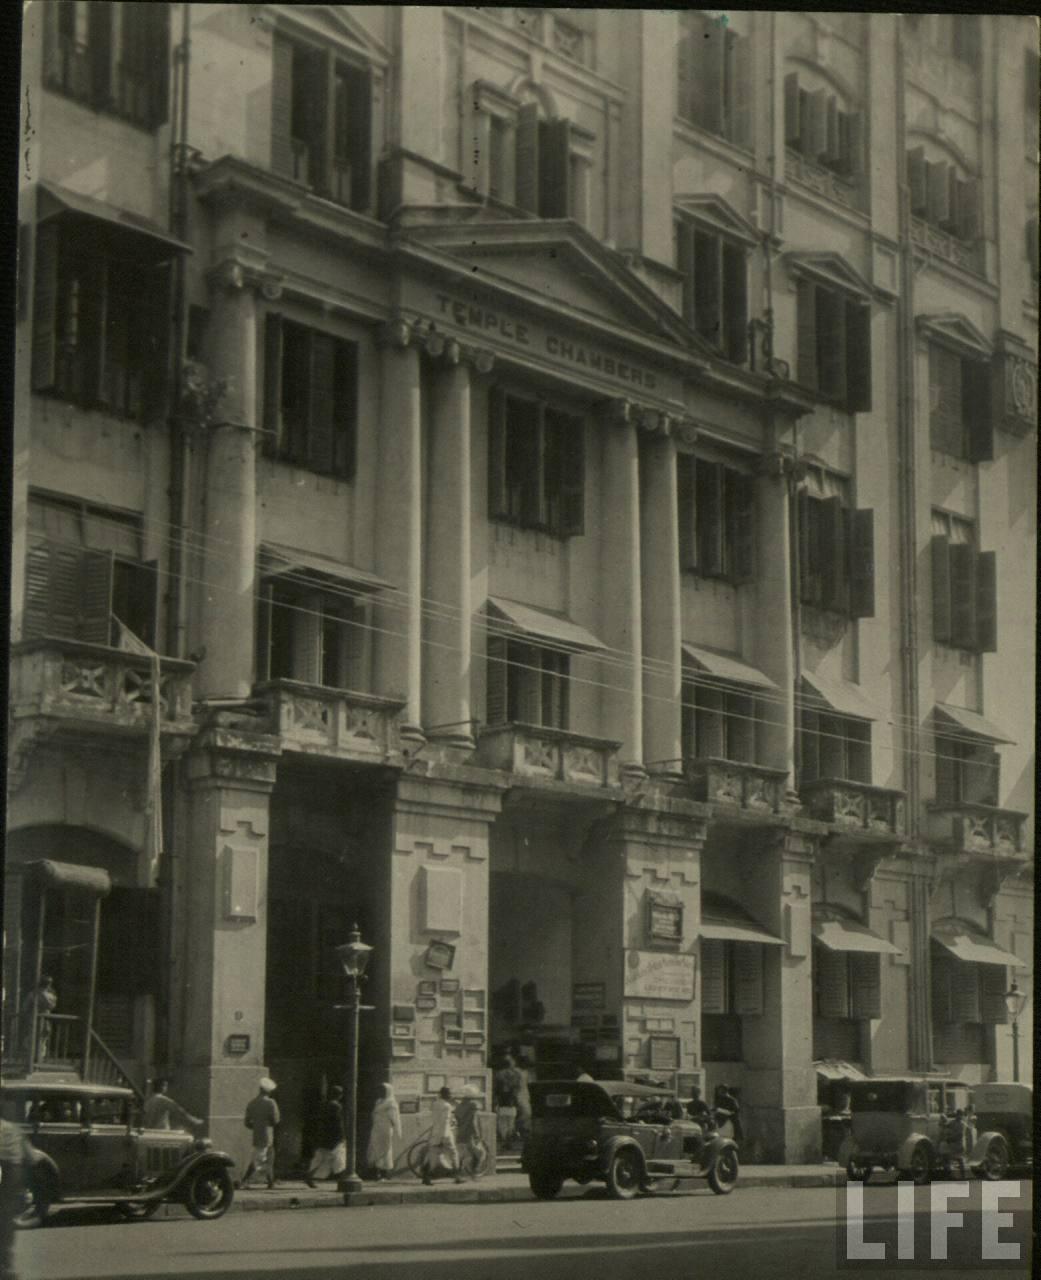 Temple Chambers Building - Calcutta (Kolkata)